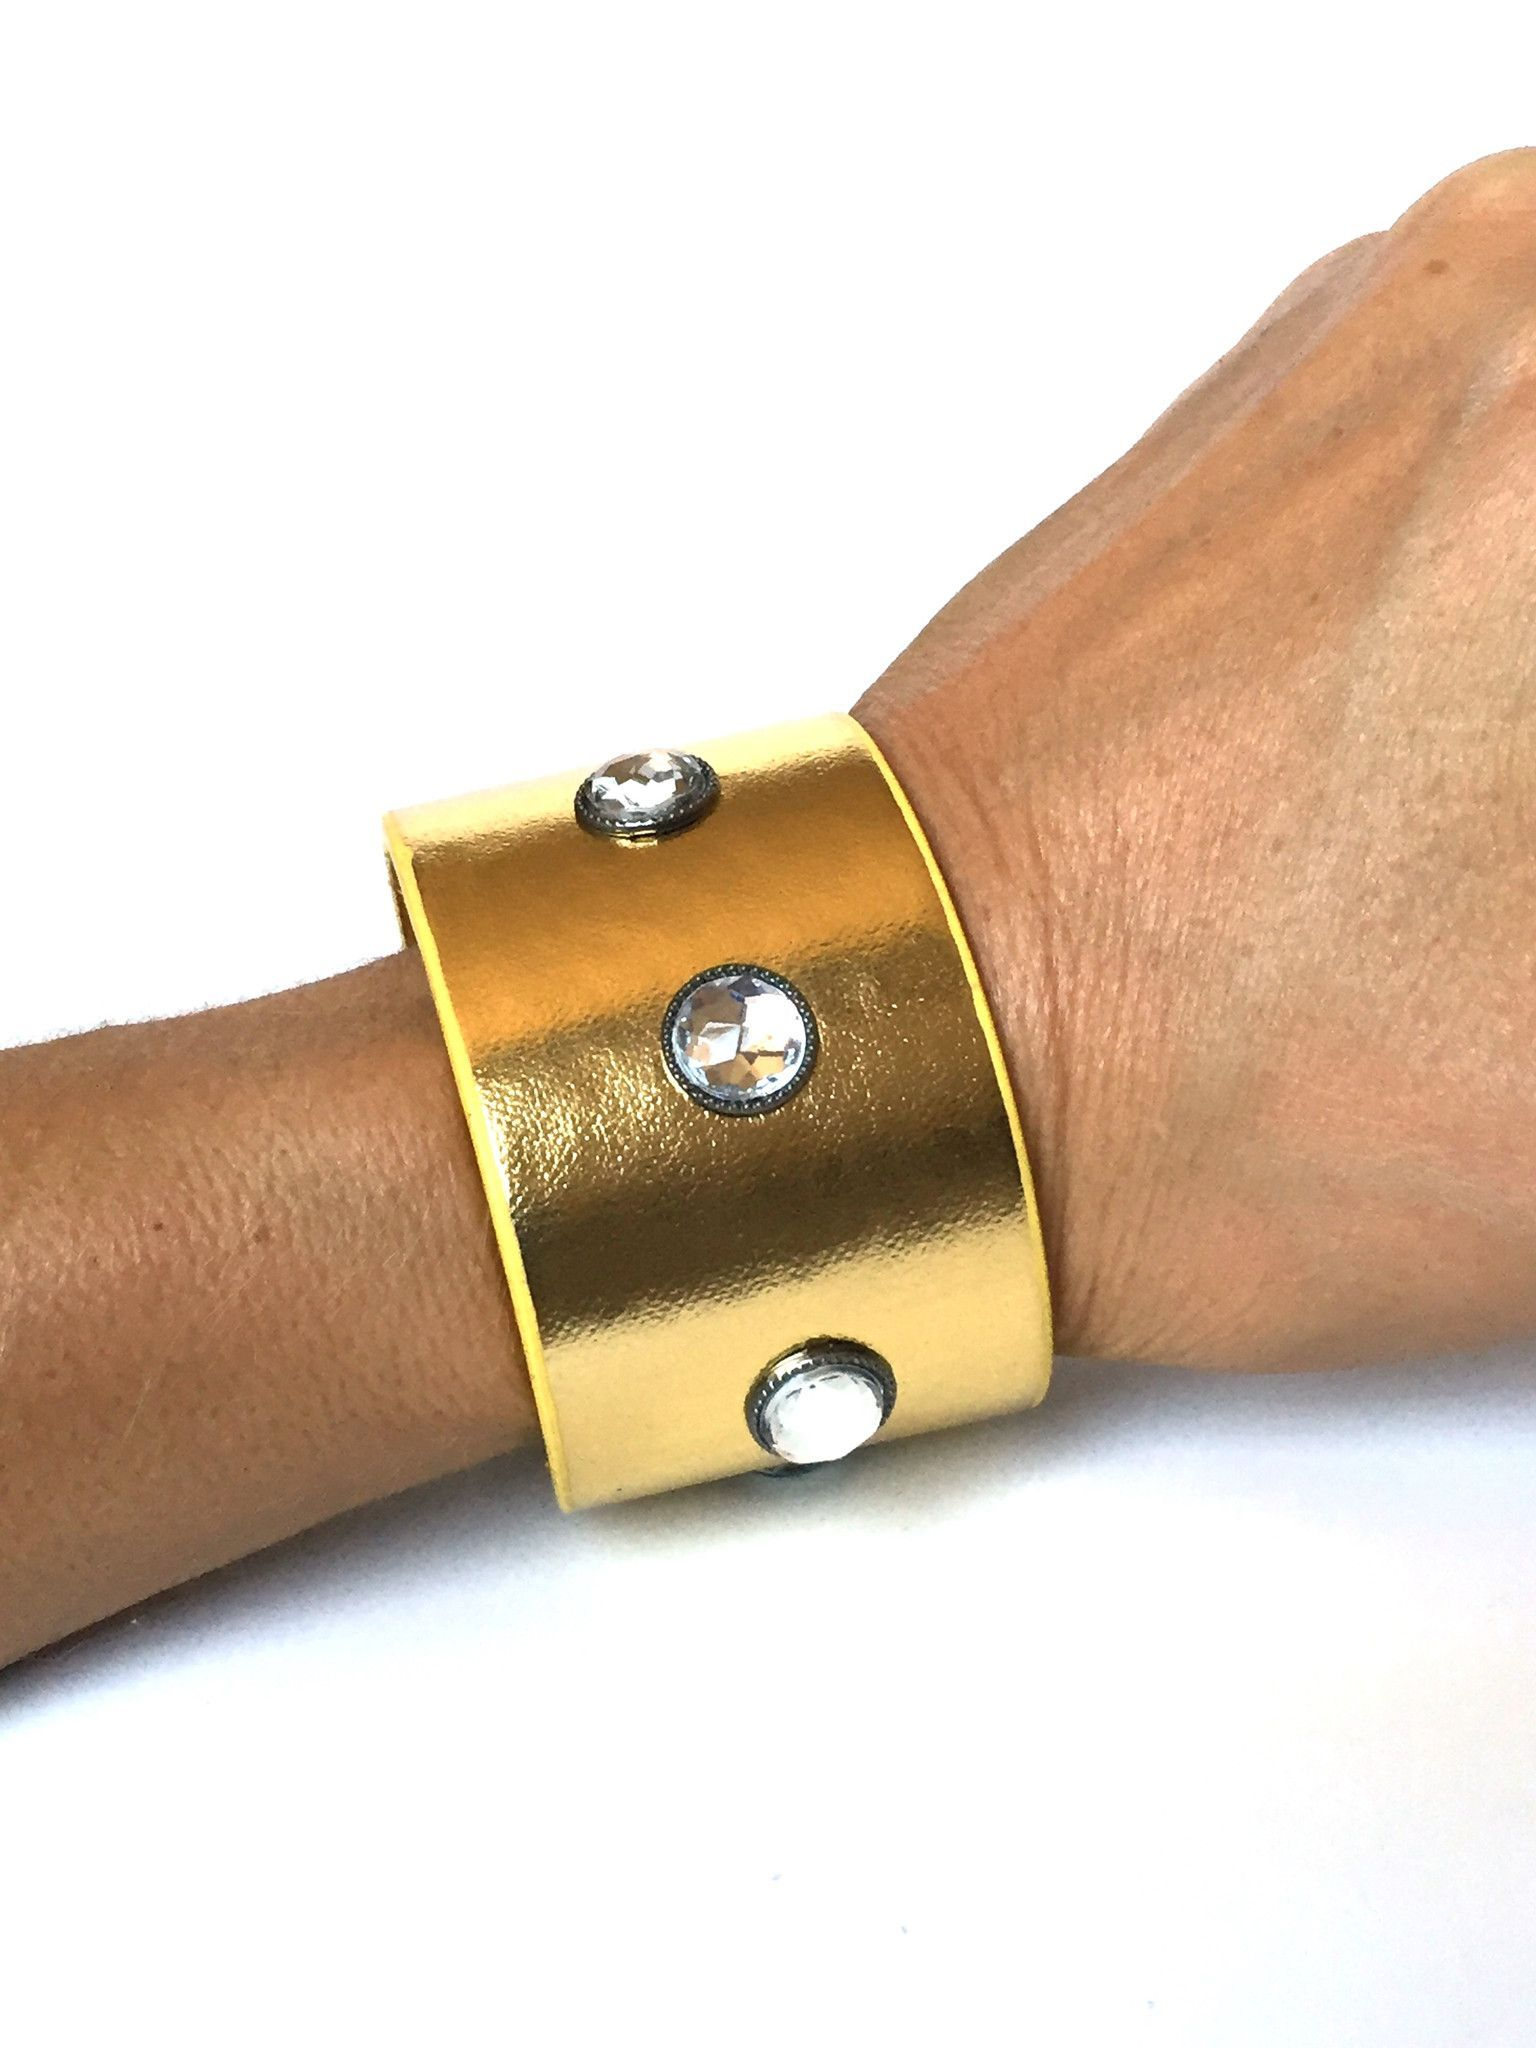 Womenus wide gold studded bracelet cuff wristband wristcuff with